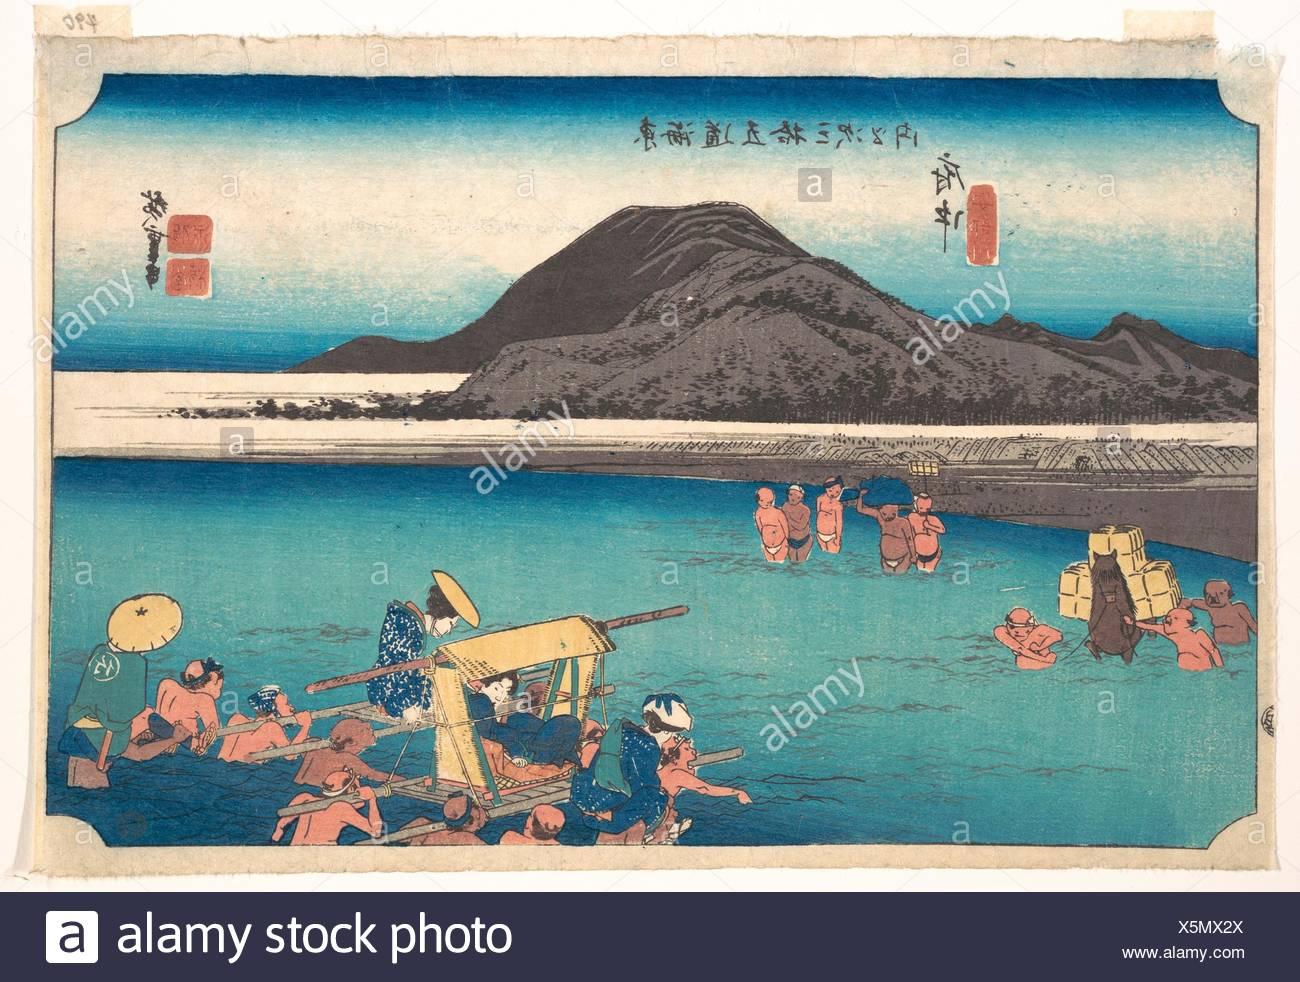 東海道五oä¸‰æ¬¡ä¹‹å†… 府中 安部川/Travellers Fording the Abe River at Fuchu. Artist: Utagawa Hiroshige (Japanese, Tokyo (Edo) 1797-1858 - Stock Image